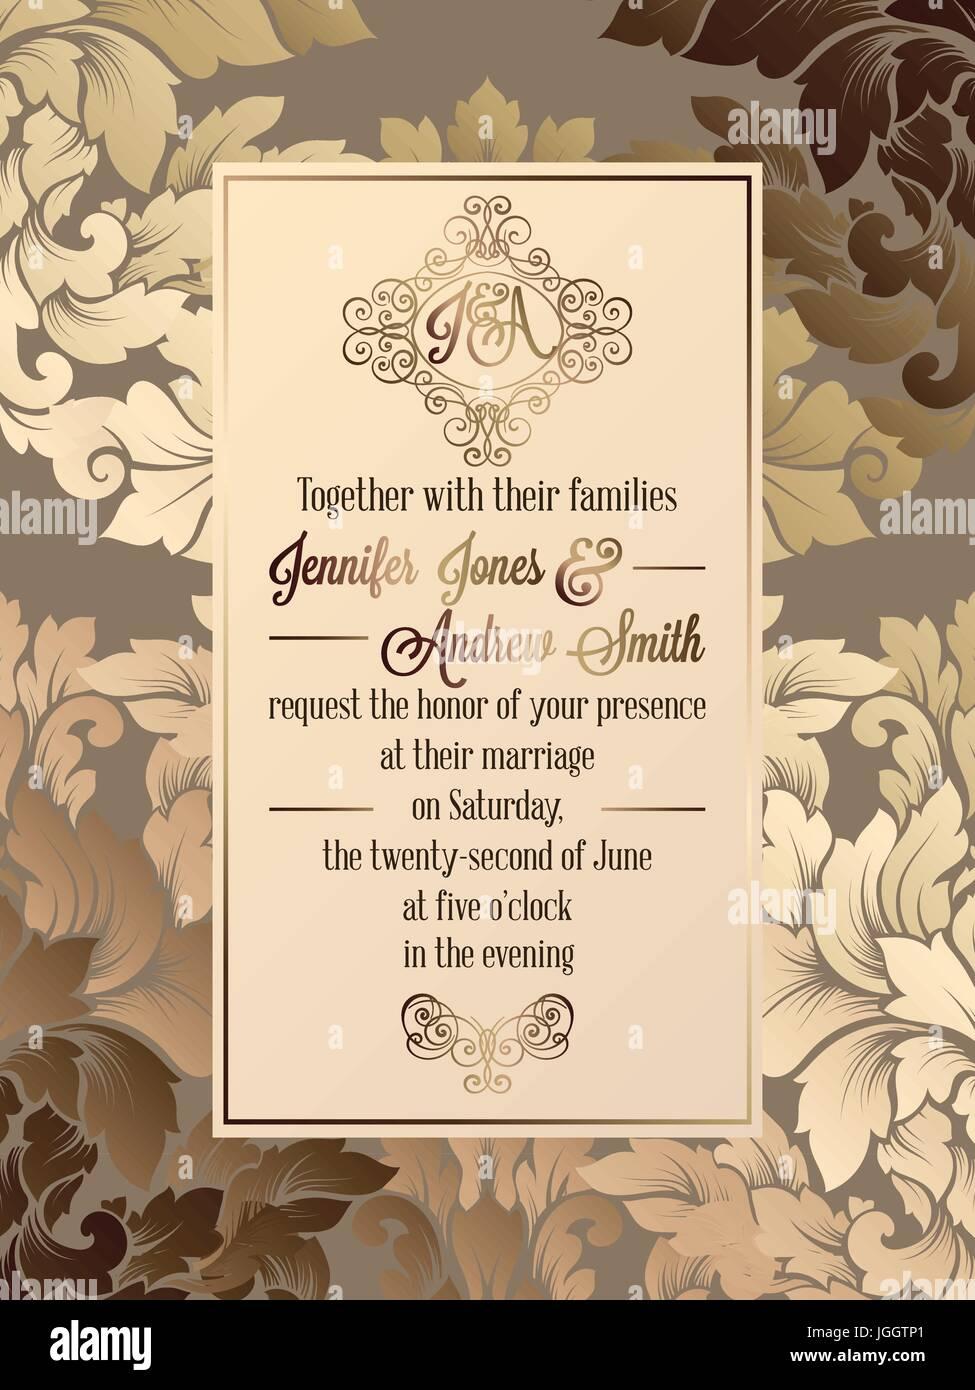 Vintage Baroque Style Wedding Invitation Card Template Elegant Stock Vector Image Art Alamy